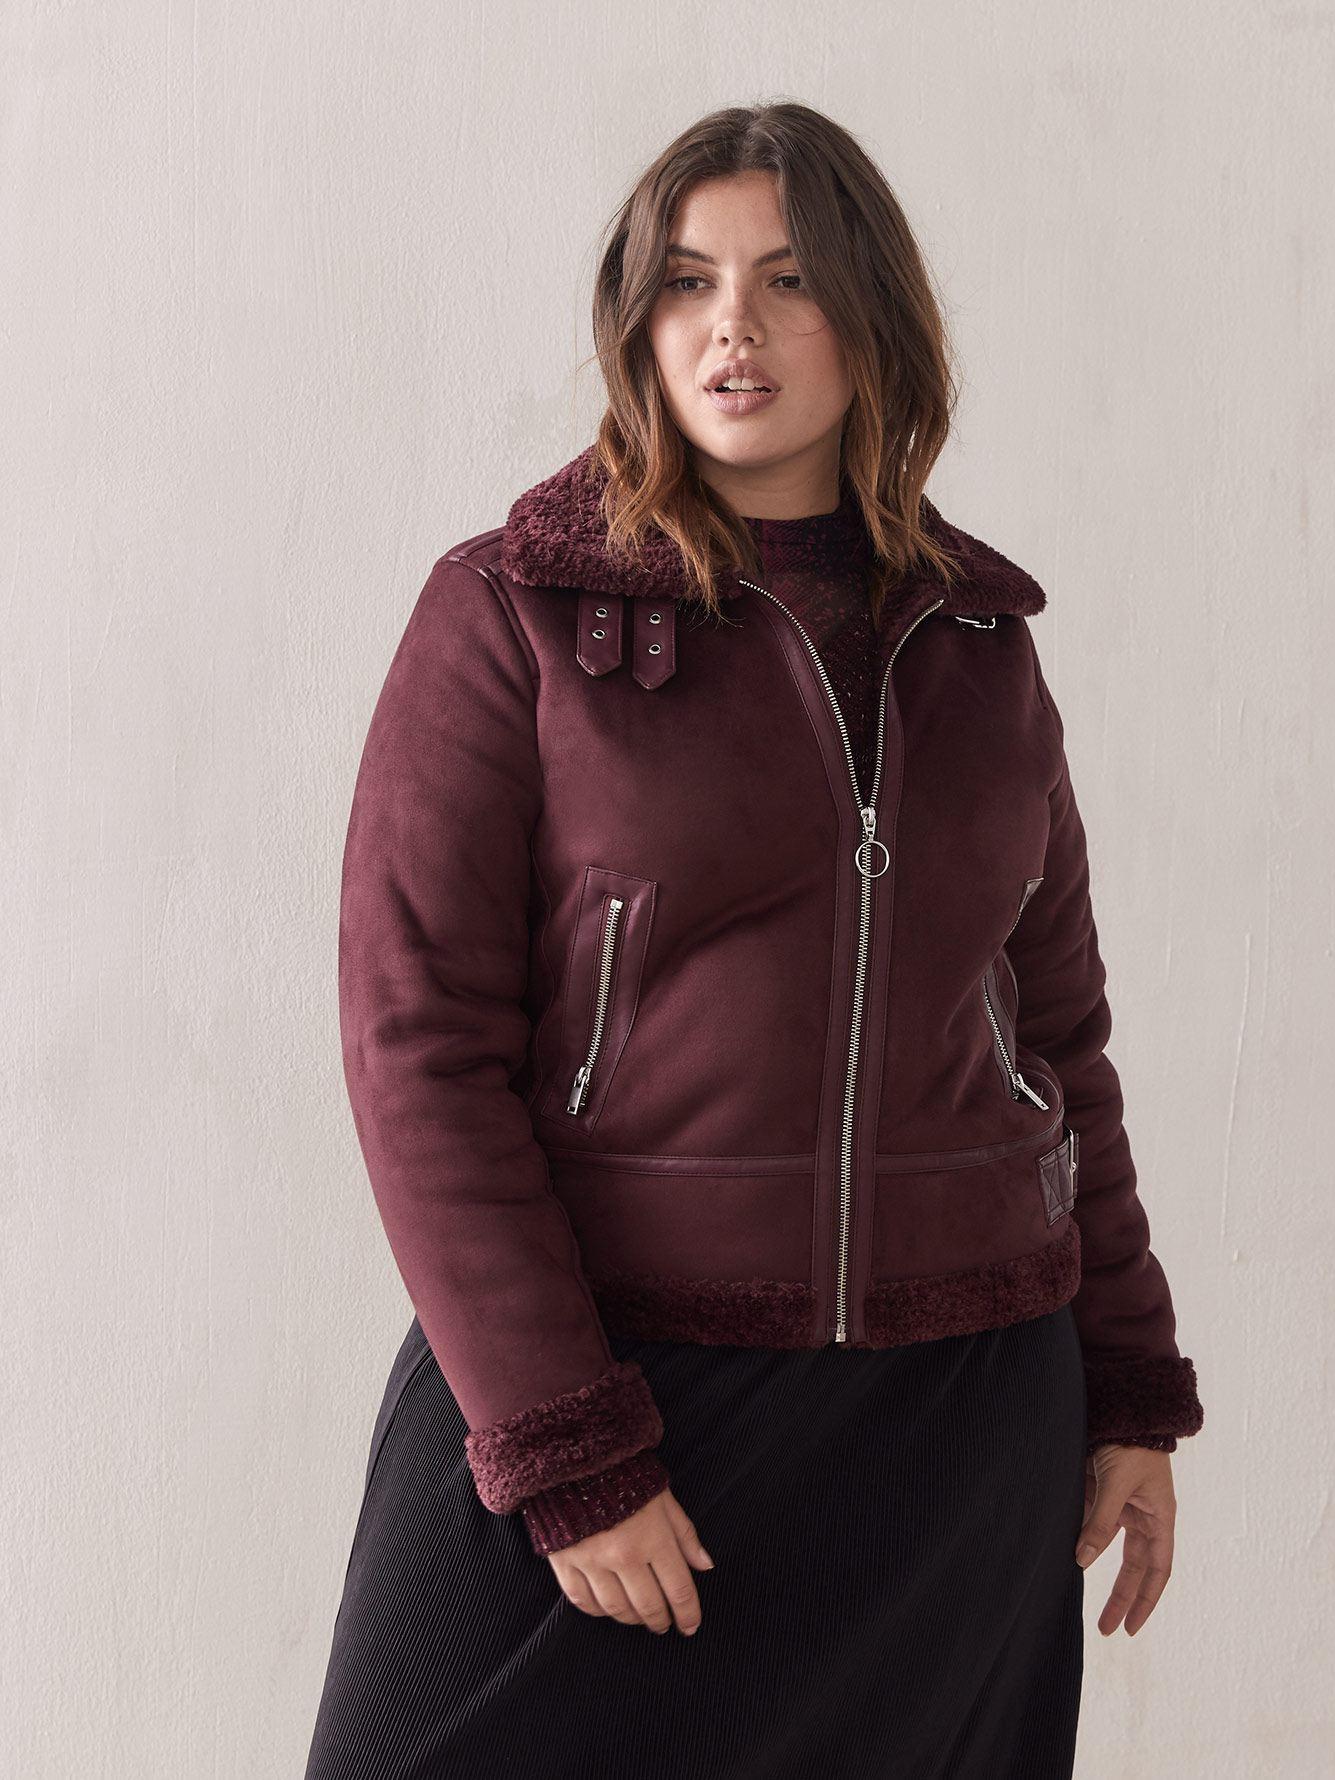 Shearling & Sherpa Jacket - Addition Elle